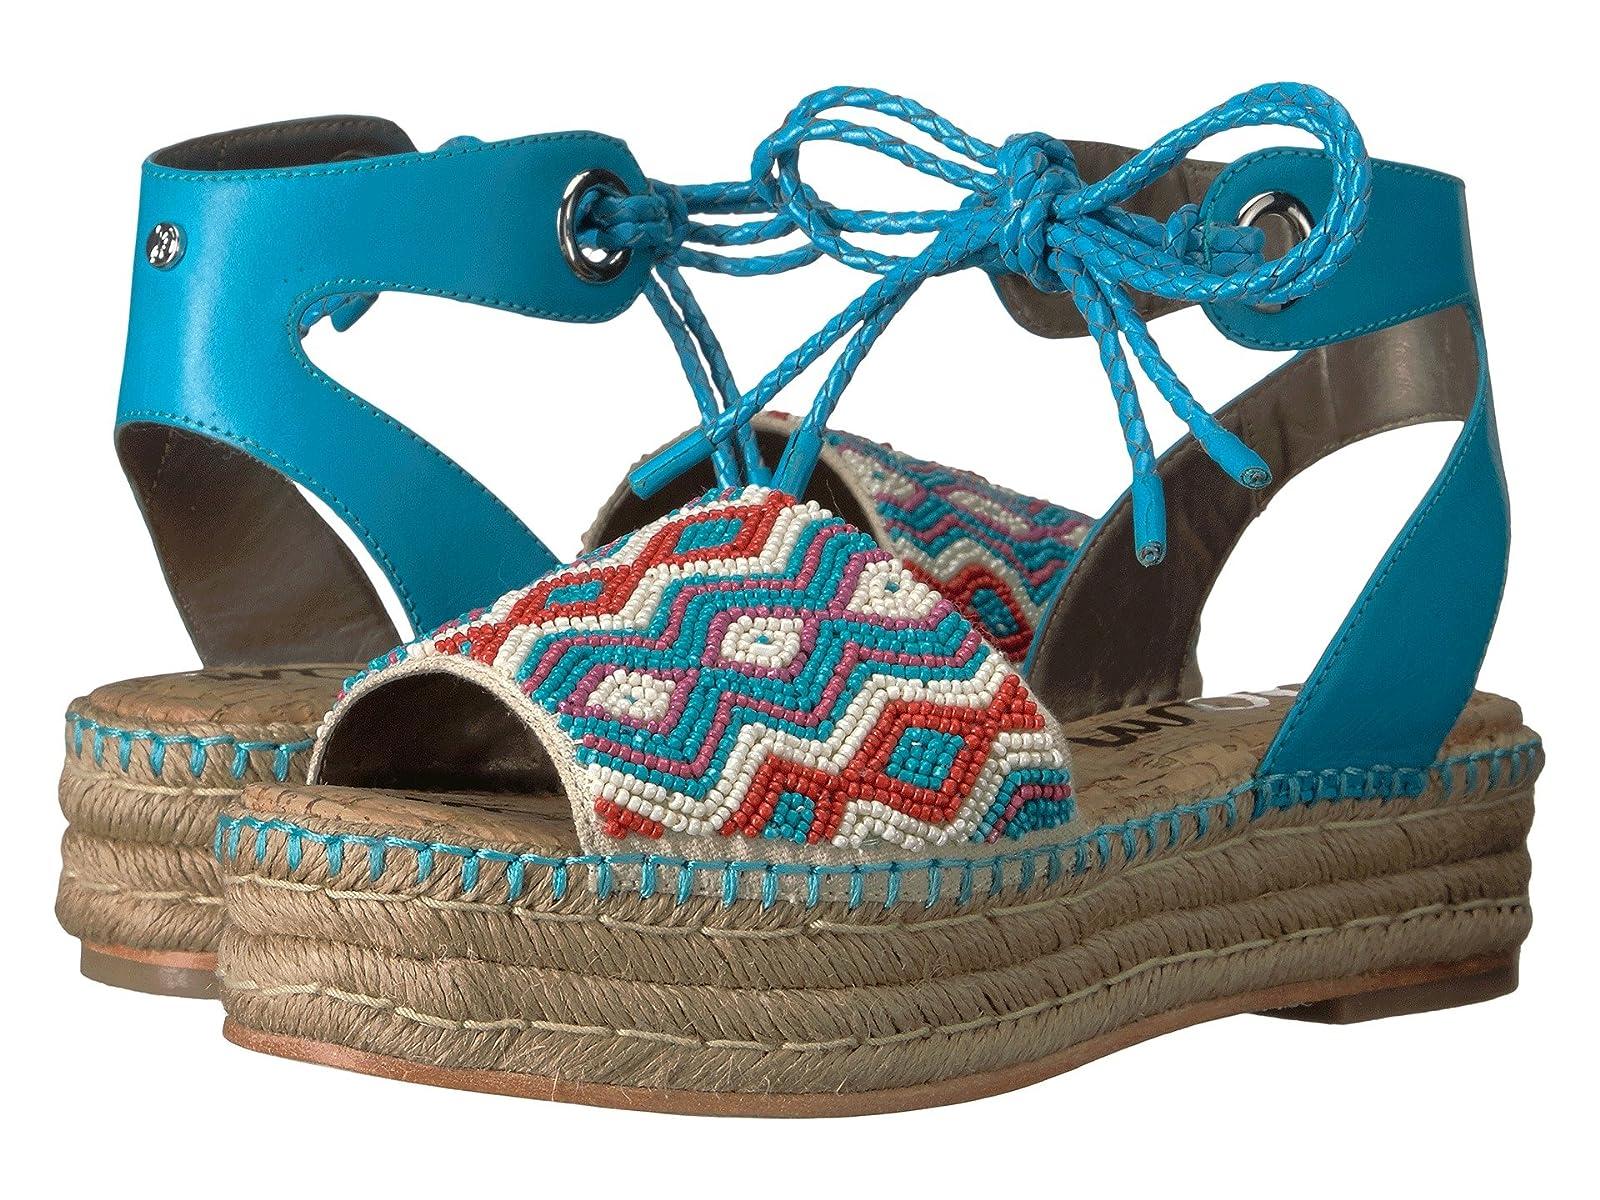 Sam Edelman NeeraCheap and distinctive eye-catching shoes